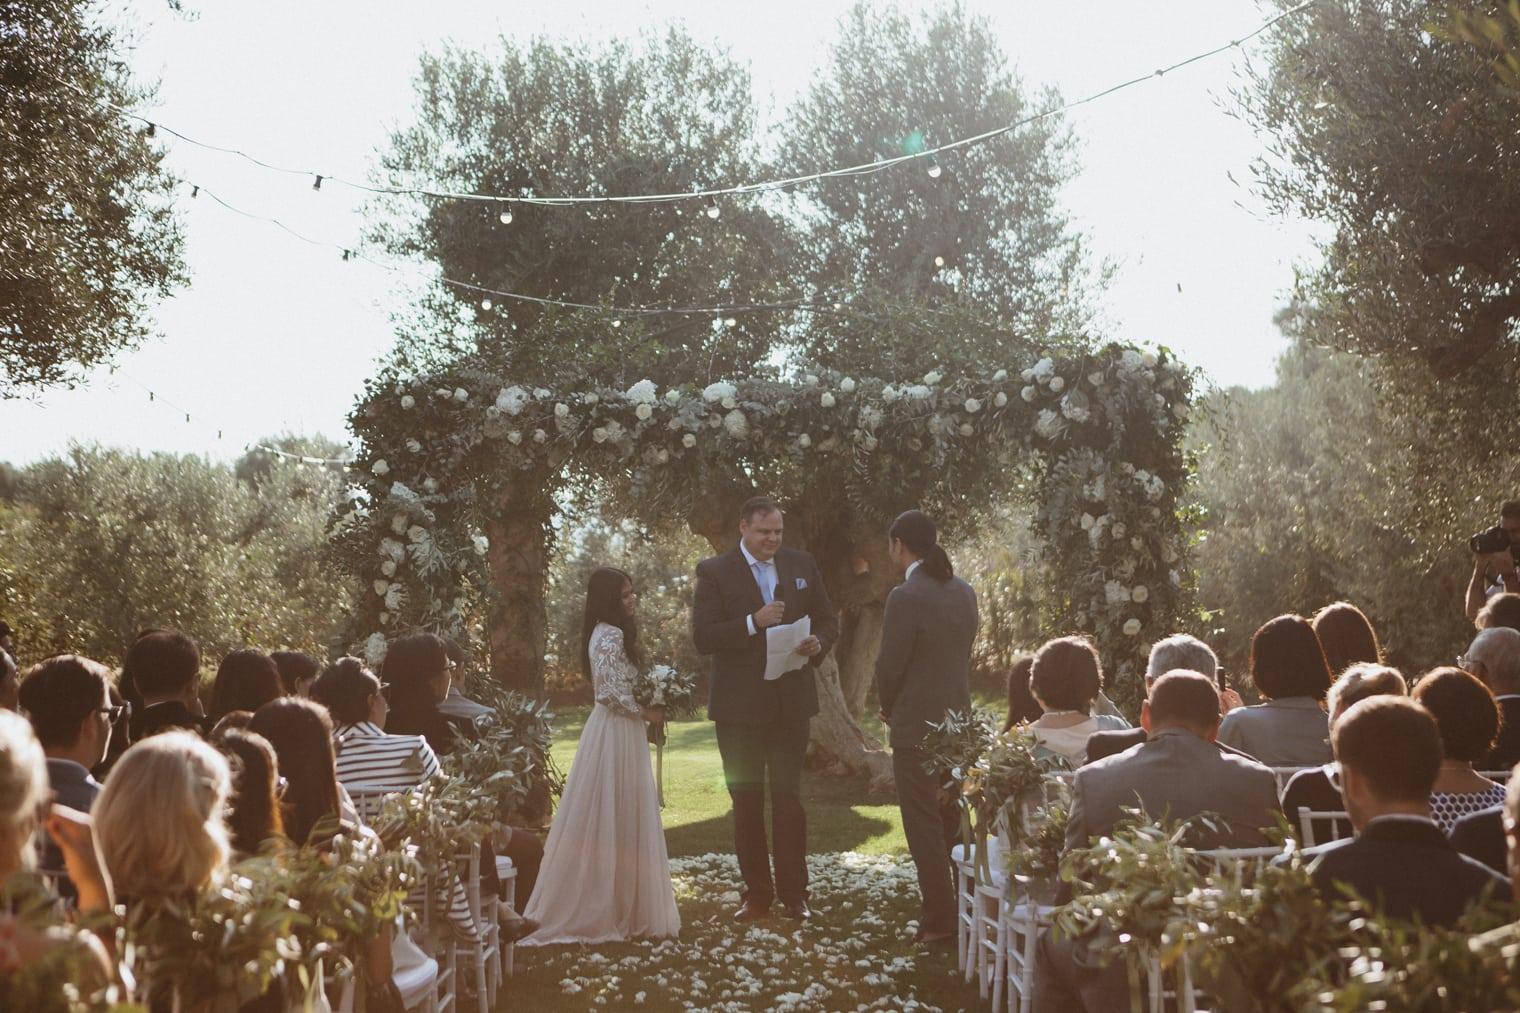 Apulian wedding ceremony at masseria torre coccaro